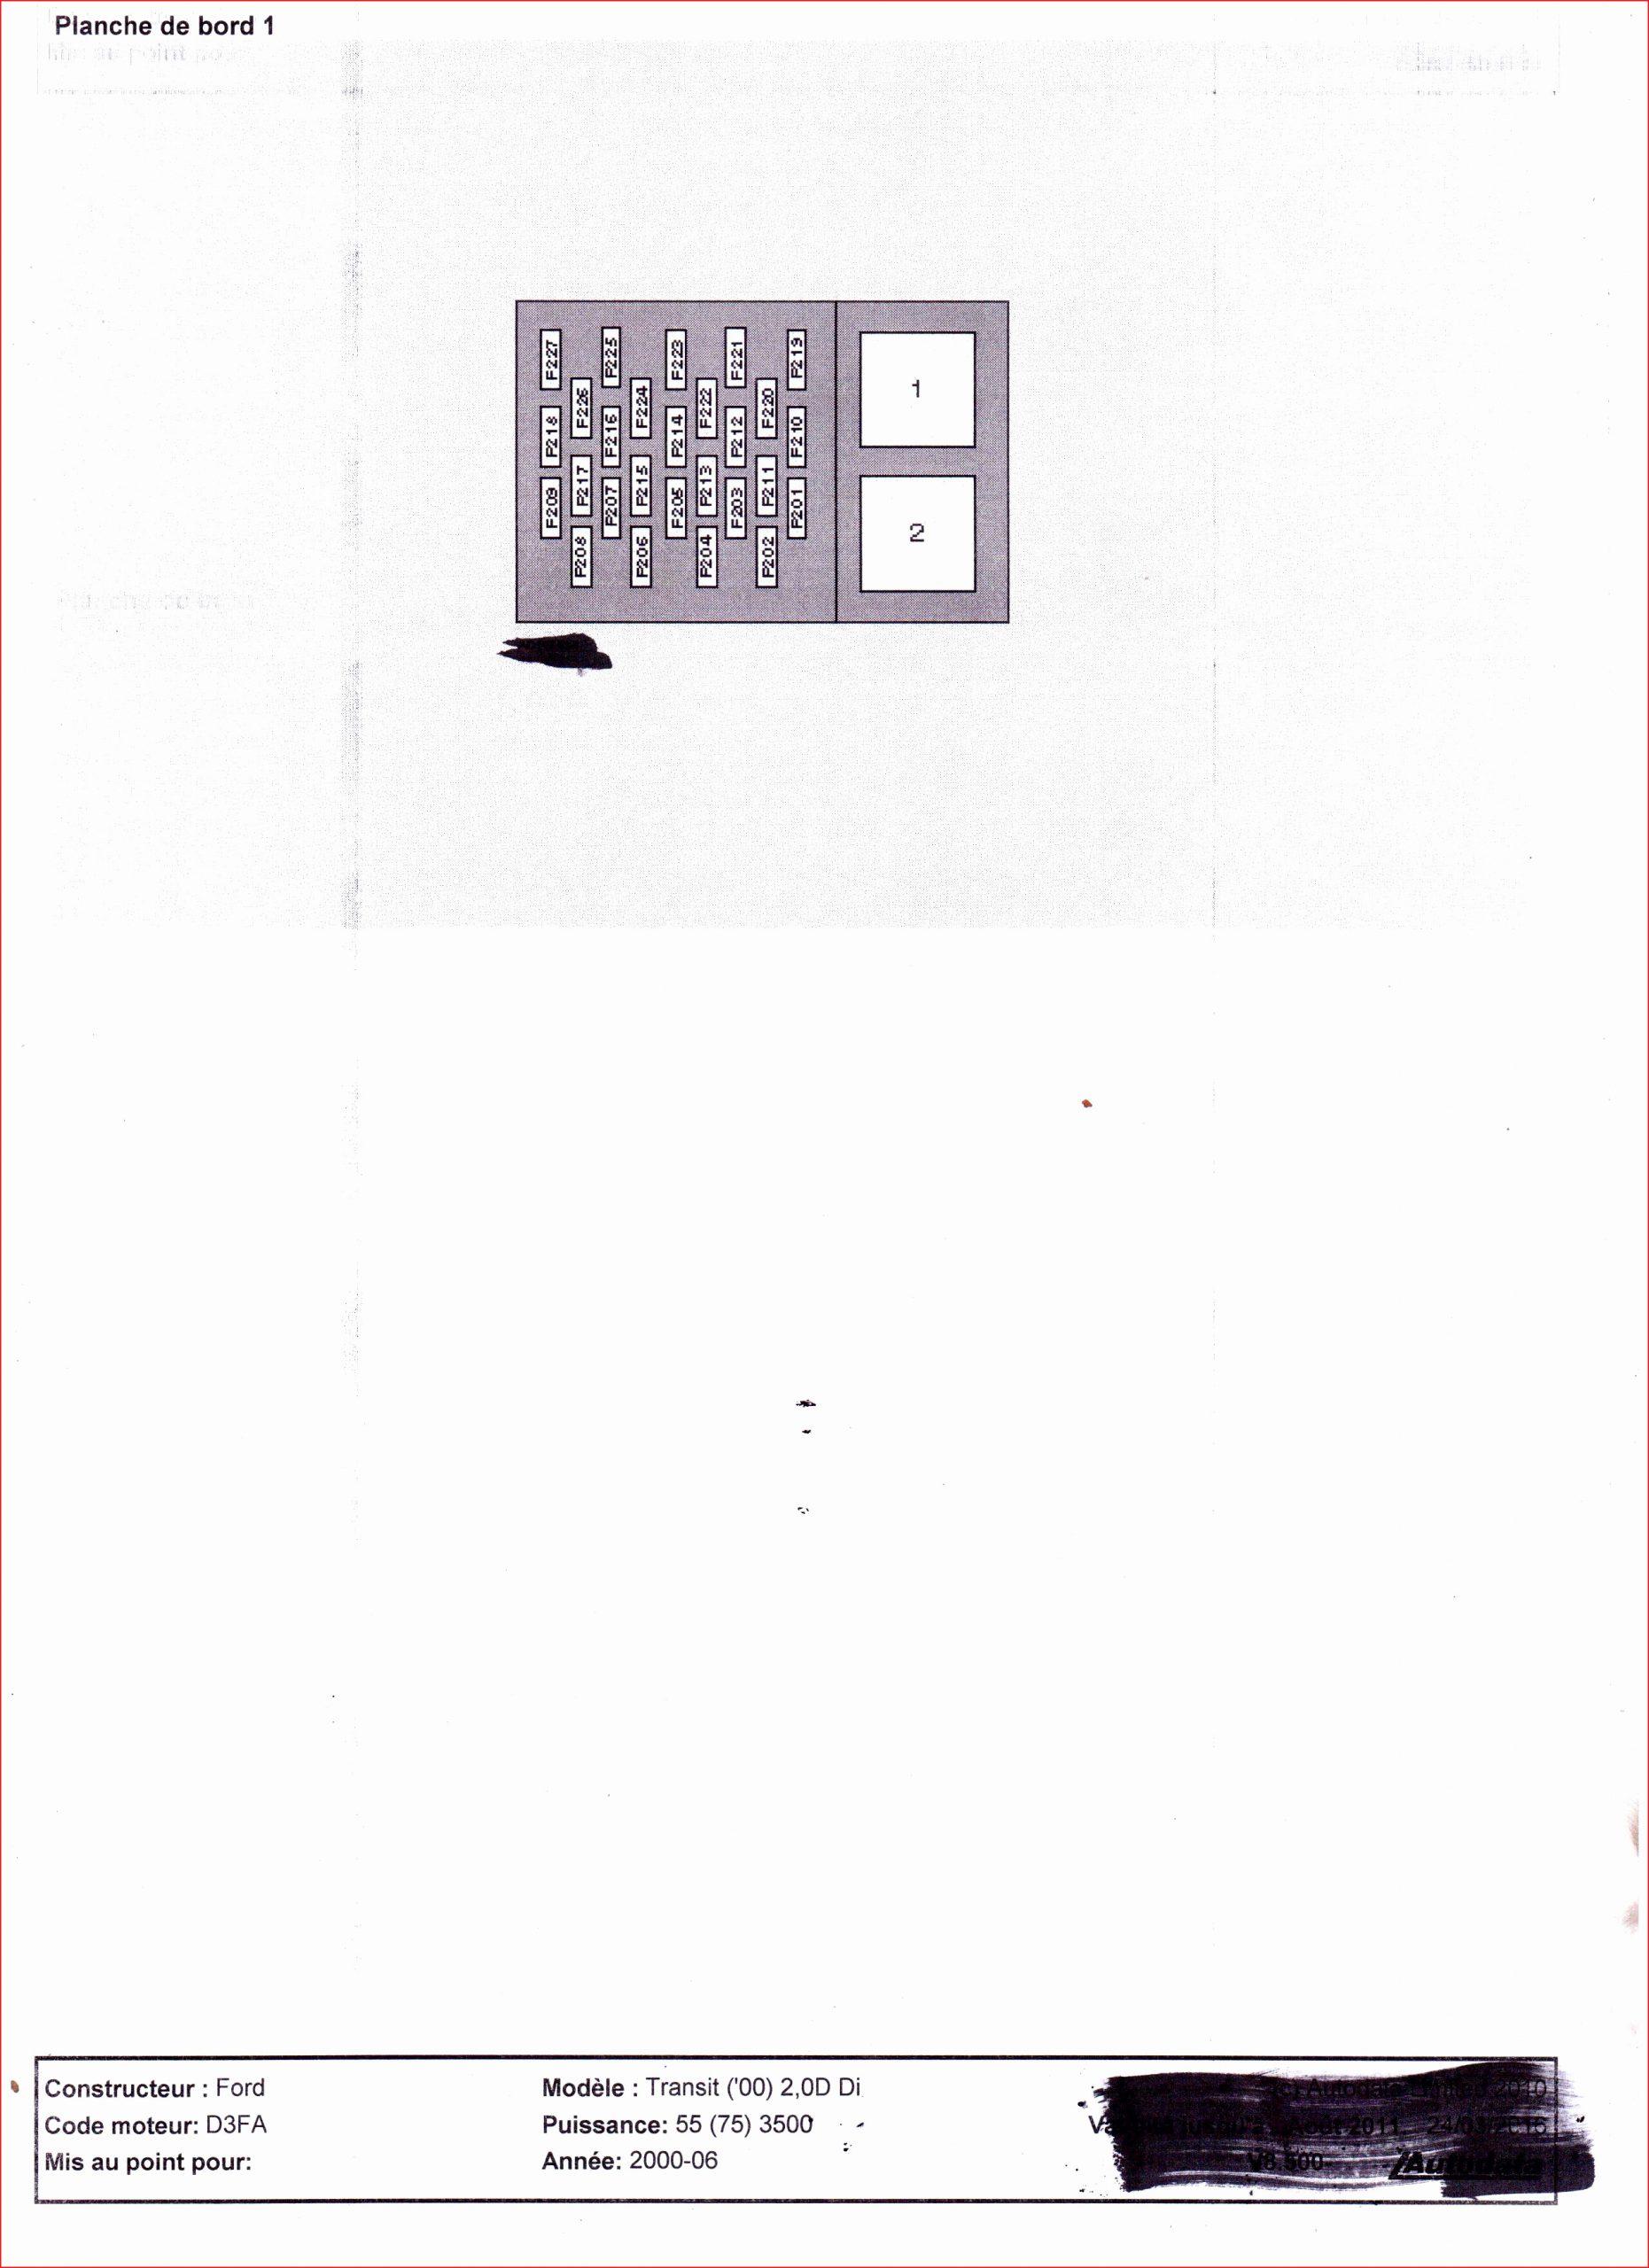 Haut Piscine Filtre Sable Galerie De Piscine Idée 751340 ... encequiconcerne Pompe Piscine Castorama